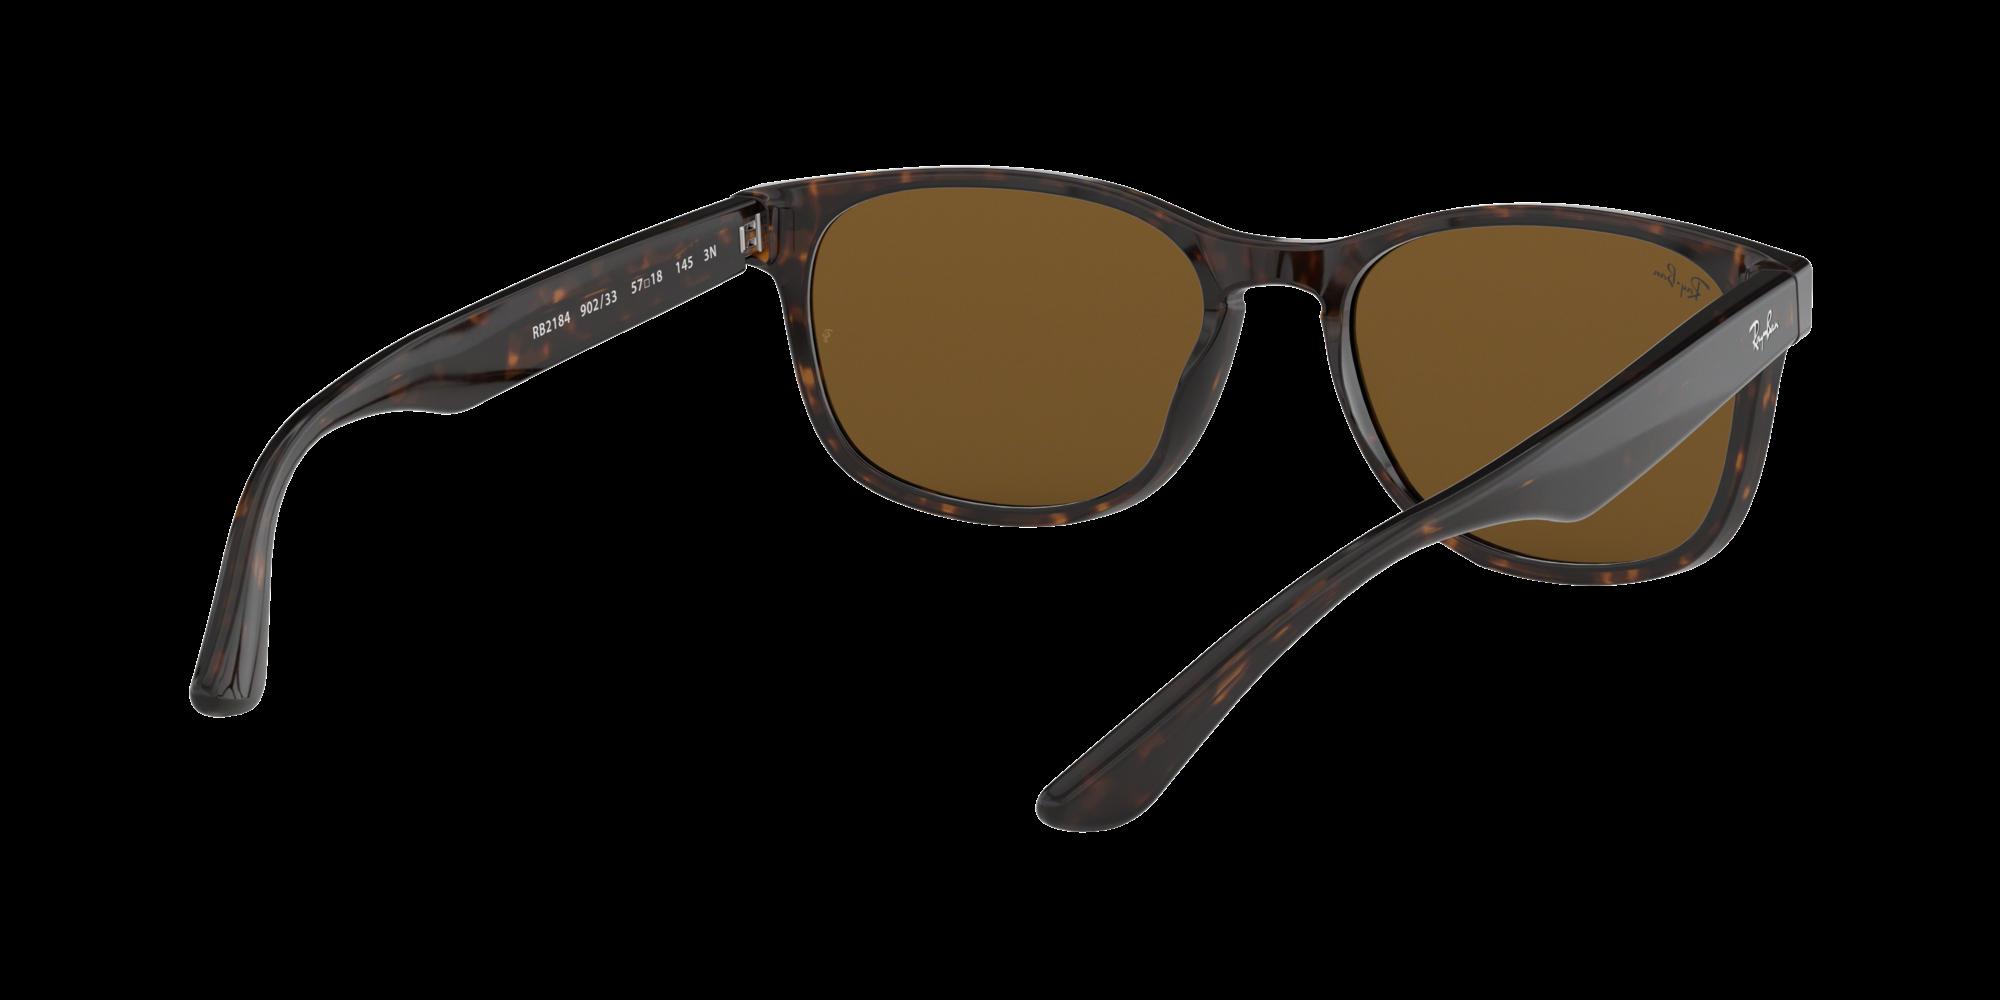 9ed66714e3 Sunglasses Ray-Ban RB2184 902 33 57-18 Tortoise Large